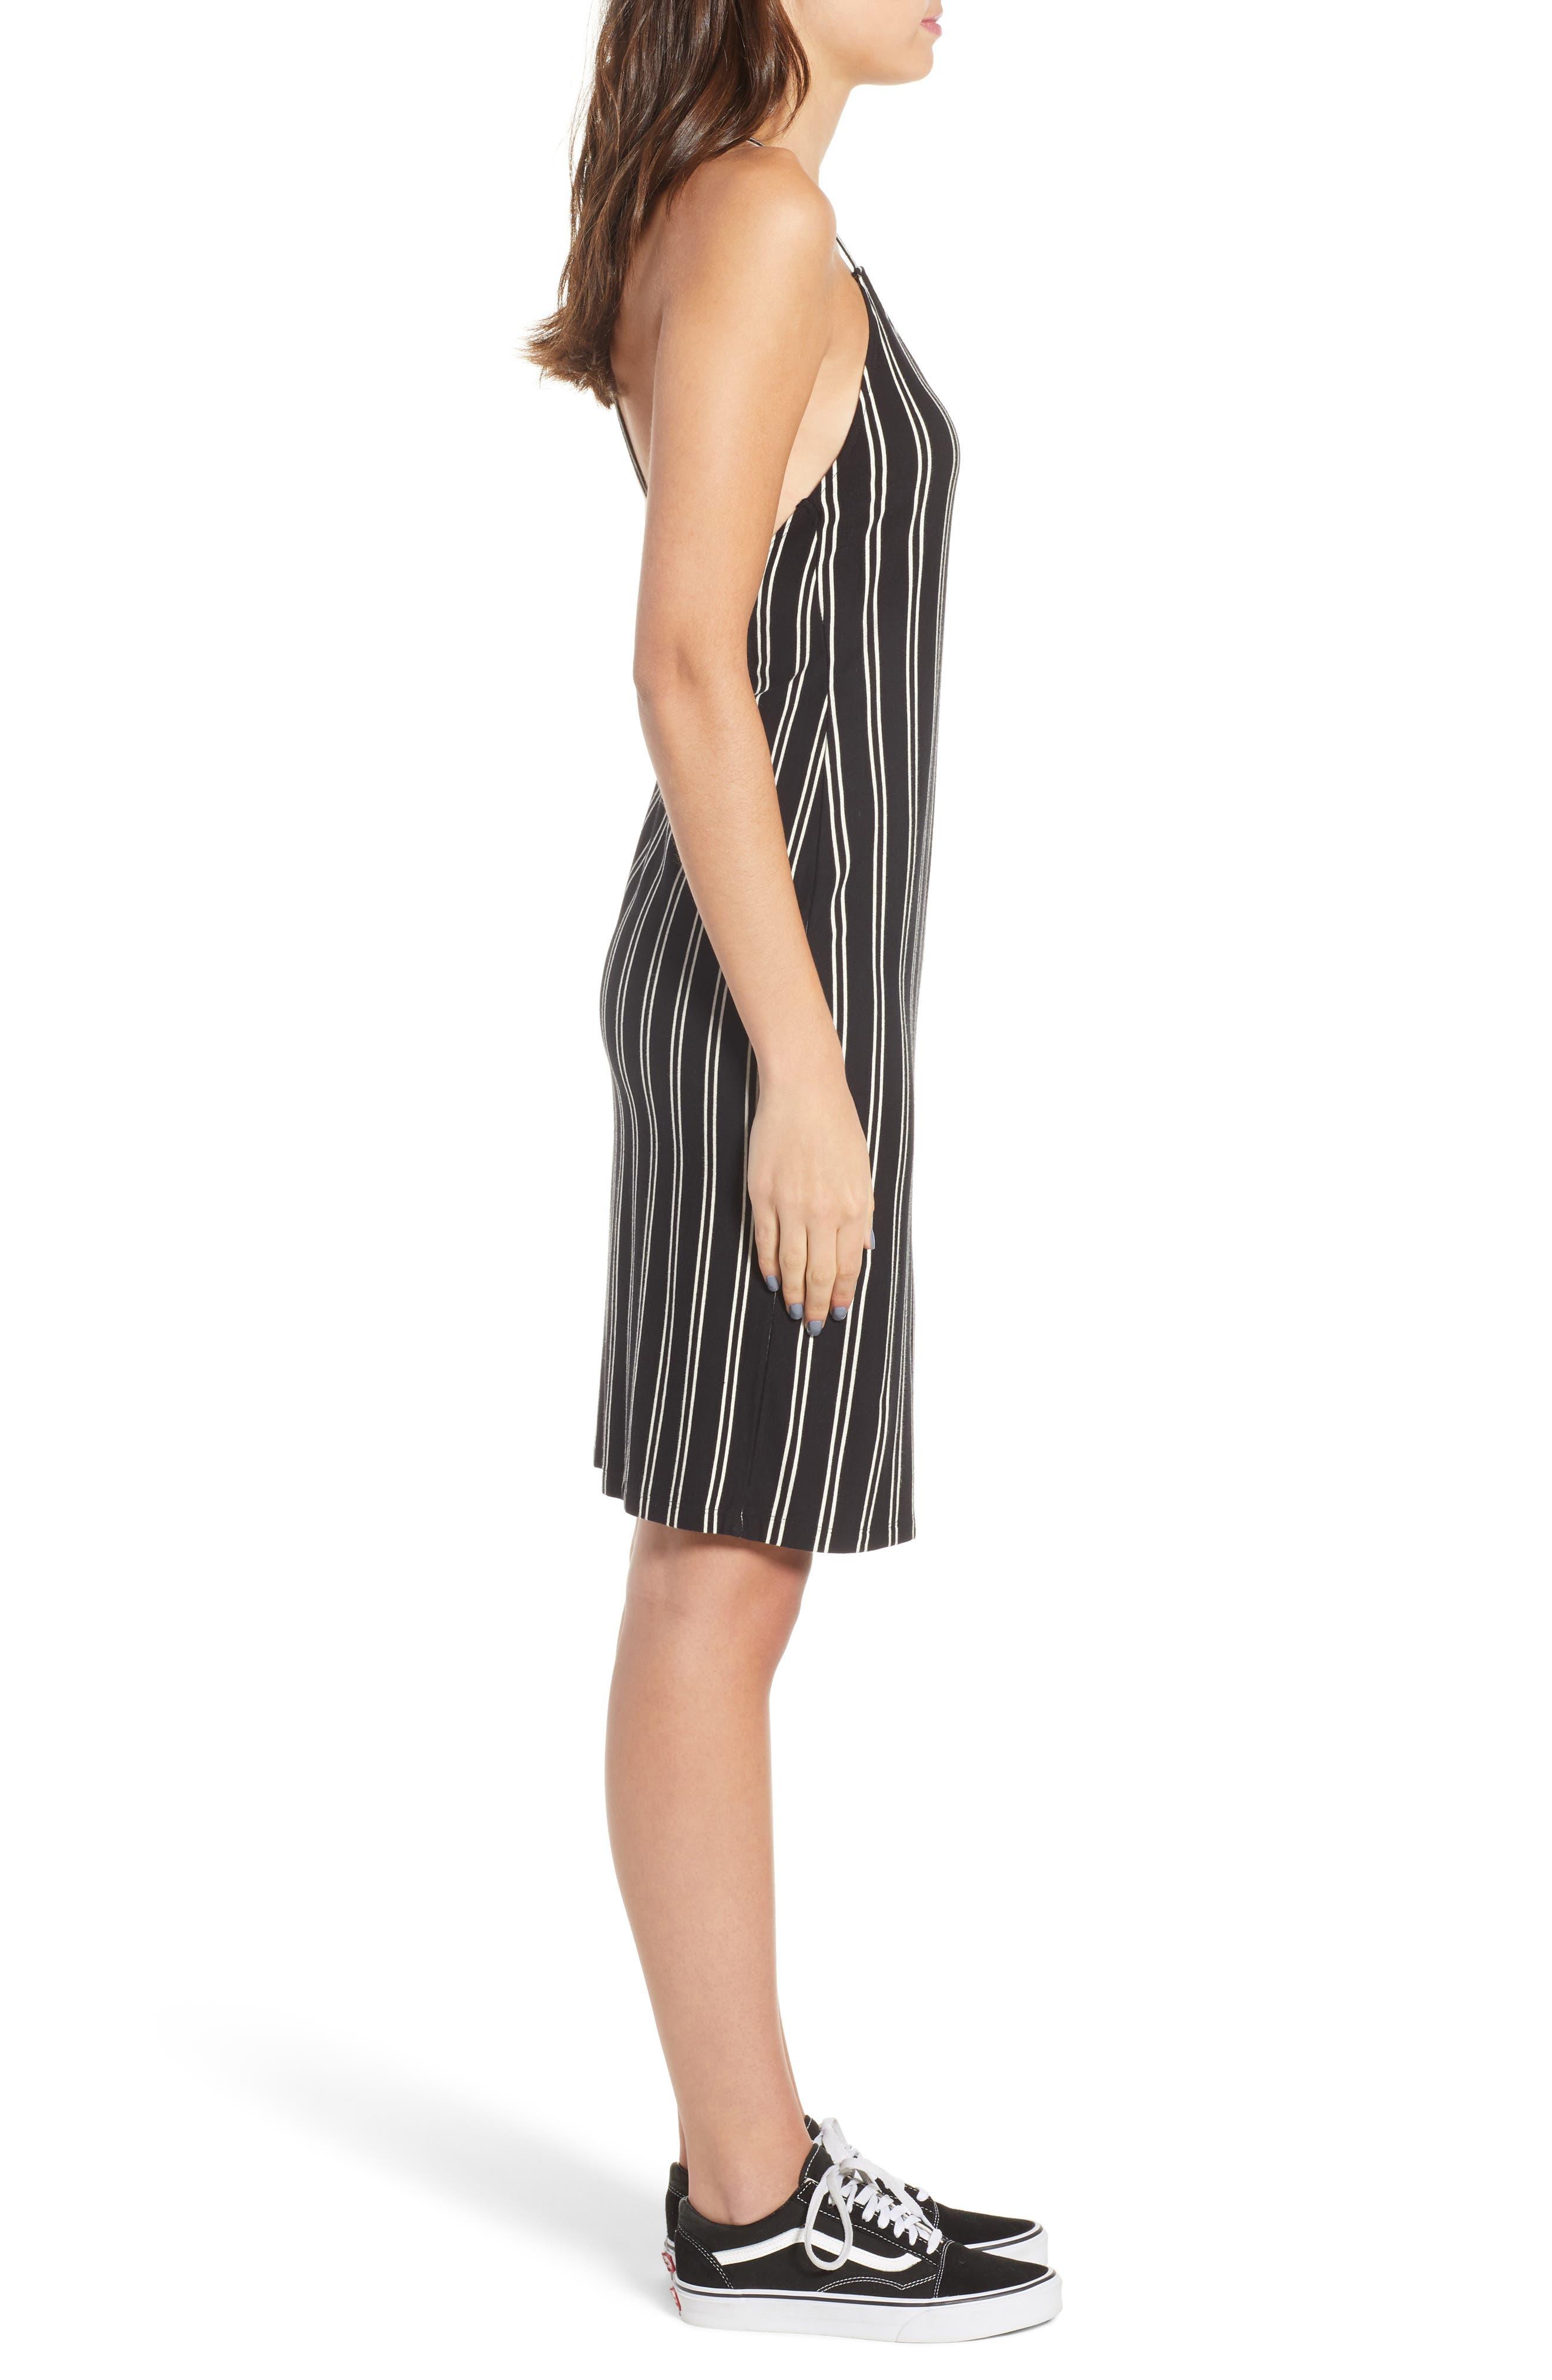 Lockette Strappy Striped Dress,                             Alternate thumbnail 3, color,                             Jet Black Multi